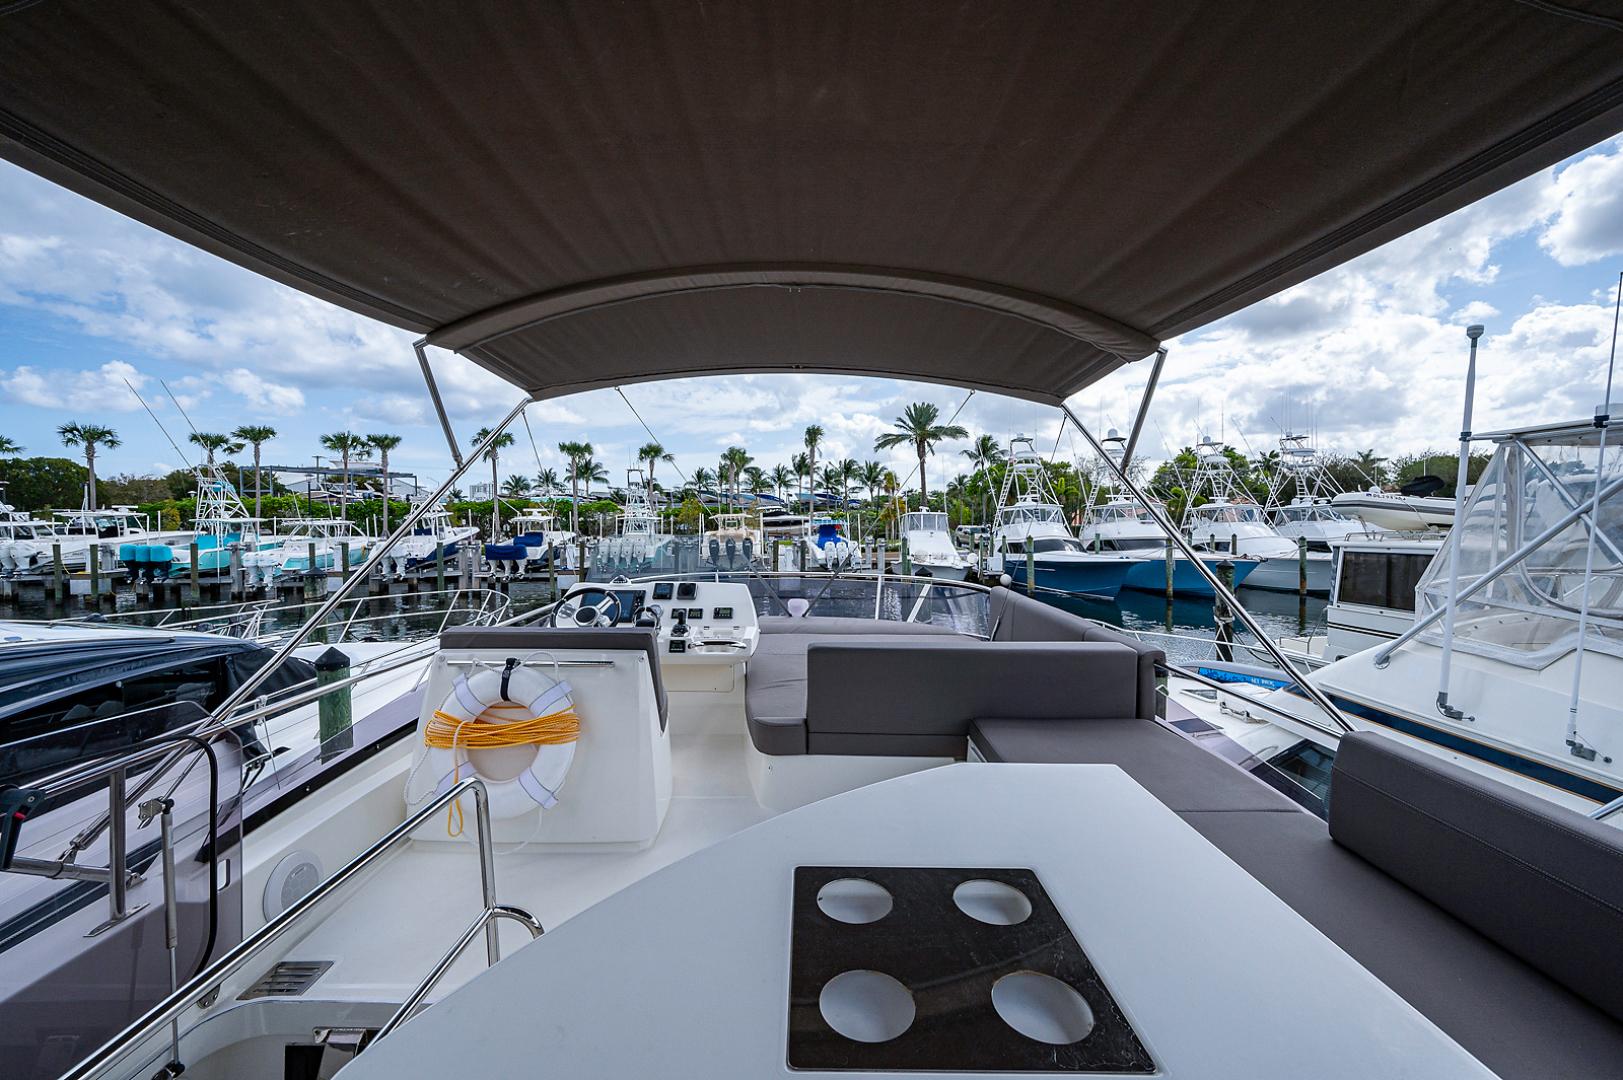 Prestige-460 Flybridge 2018-SEAQUEL Palm Beach Gardens-Florida-United States-Flybridge-1351139 | Thumbnail